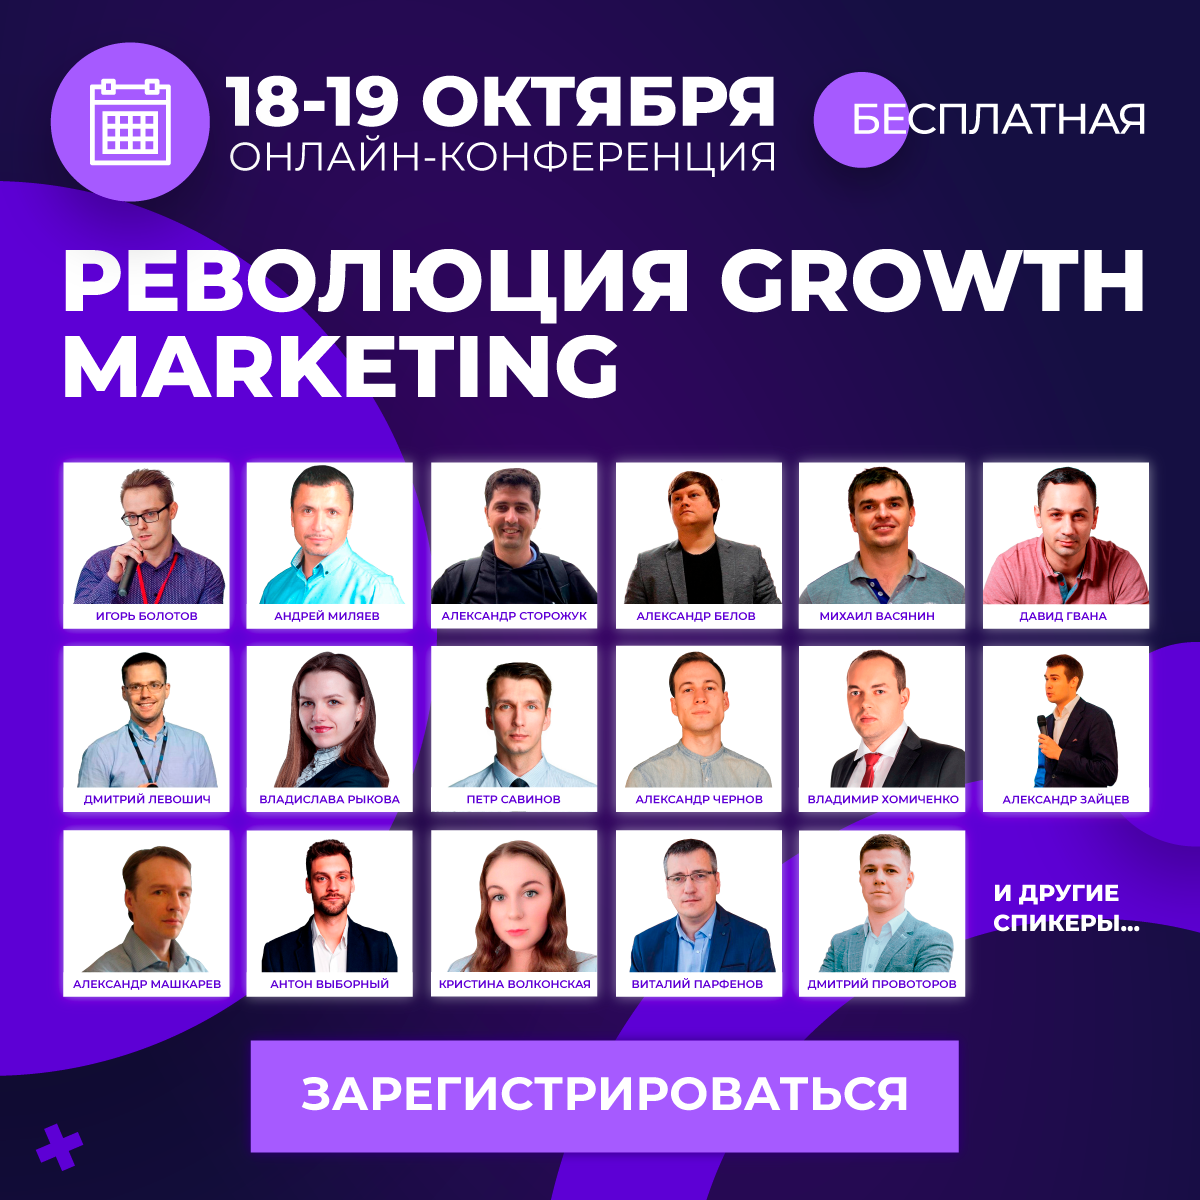 Revolyuciya Growth Marketing